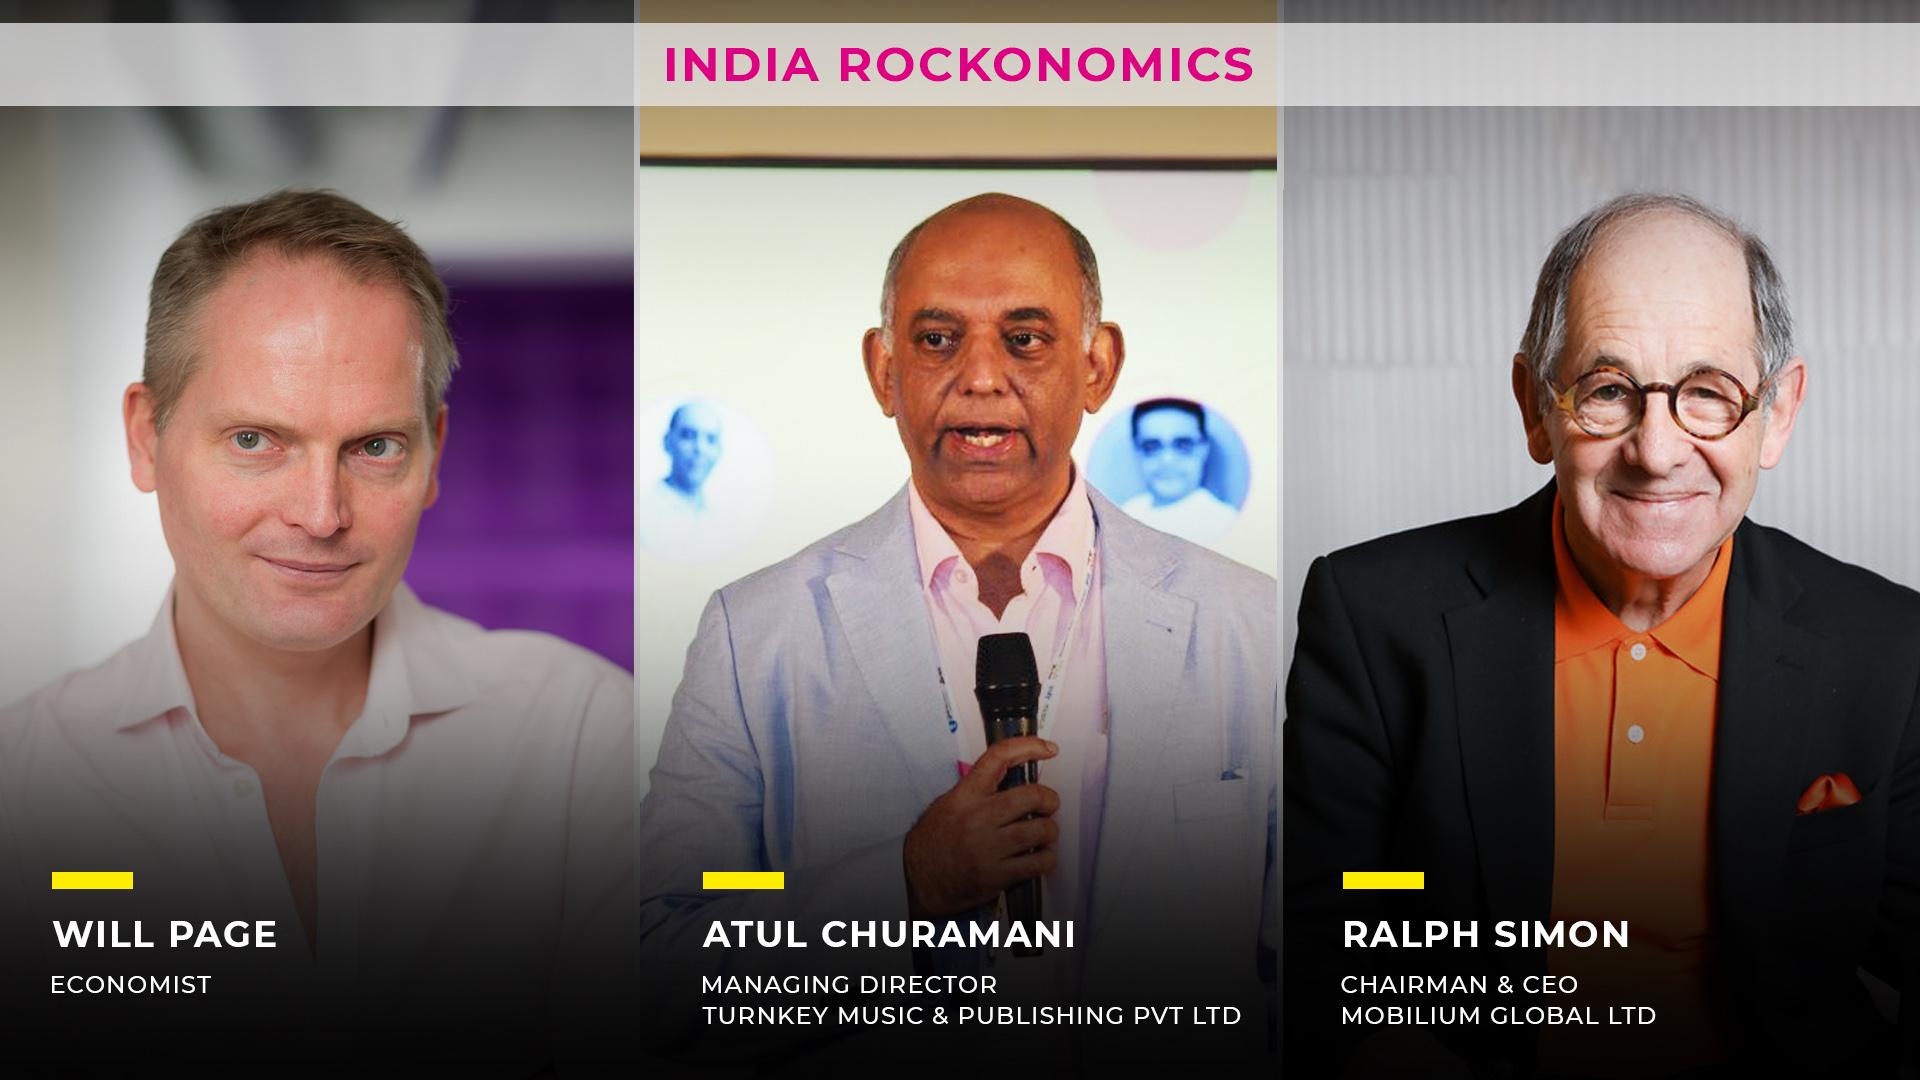 India rockonomics, 2nd AAM Session, Will Page, Atul Churamani, Ralph Simon, Evolution and future of music streaming